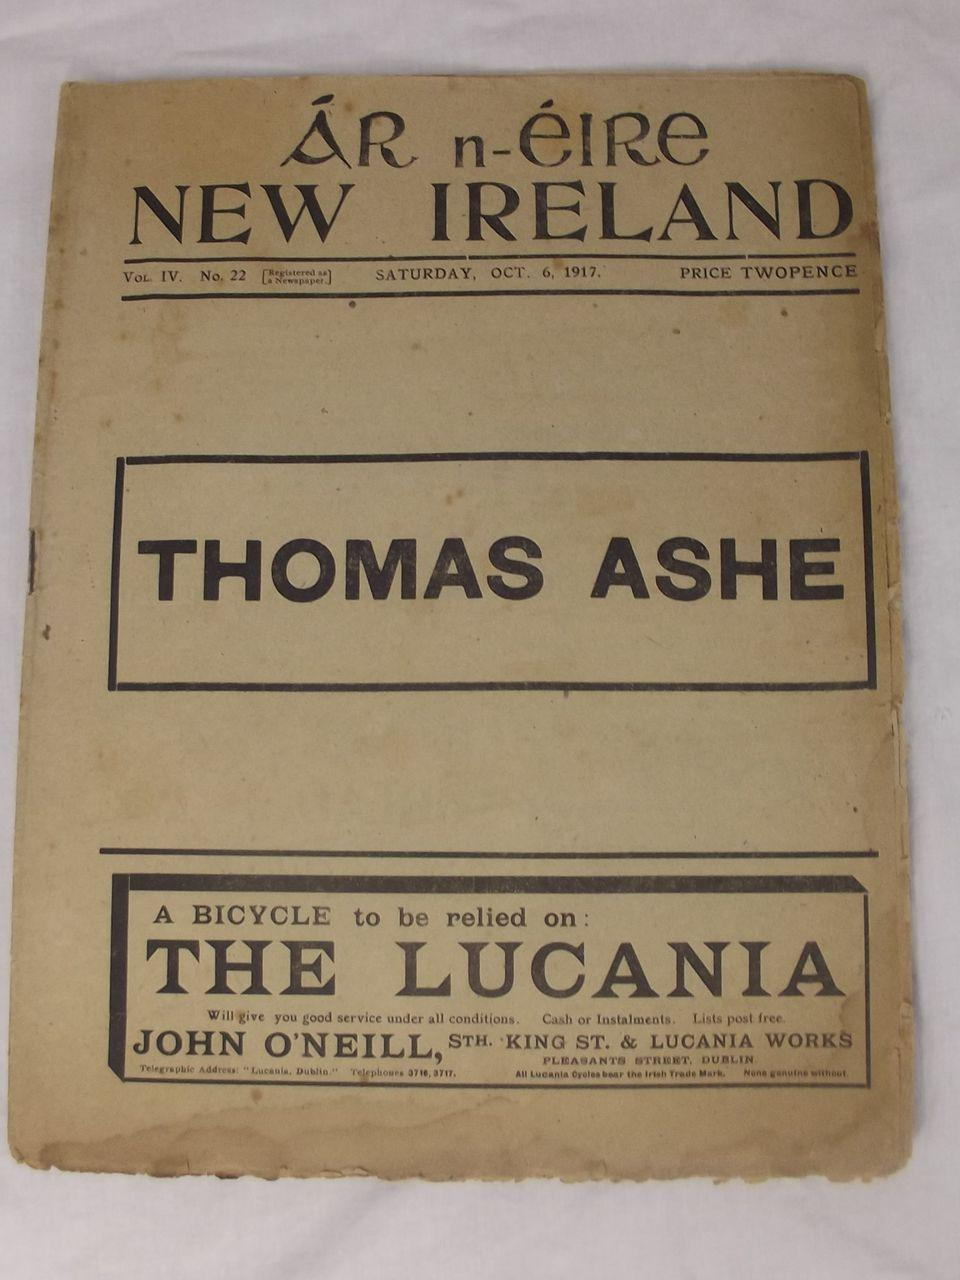 Ar n-Eire New Ireland Oct. 6, 1917 Irish Republican Newspaper